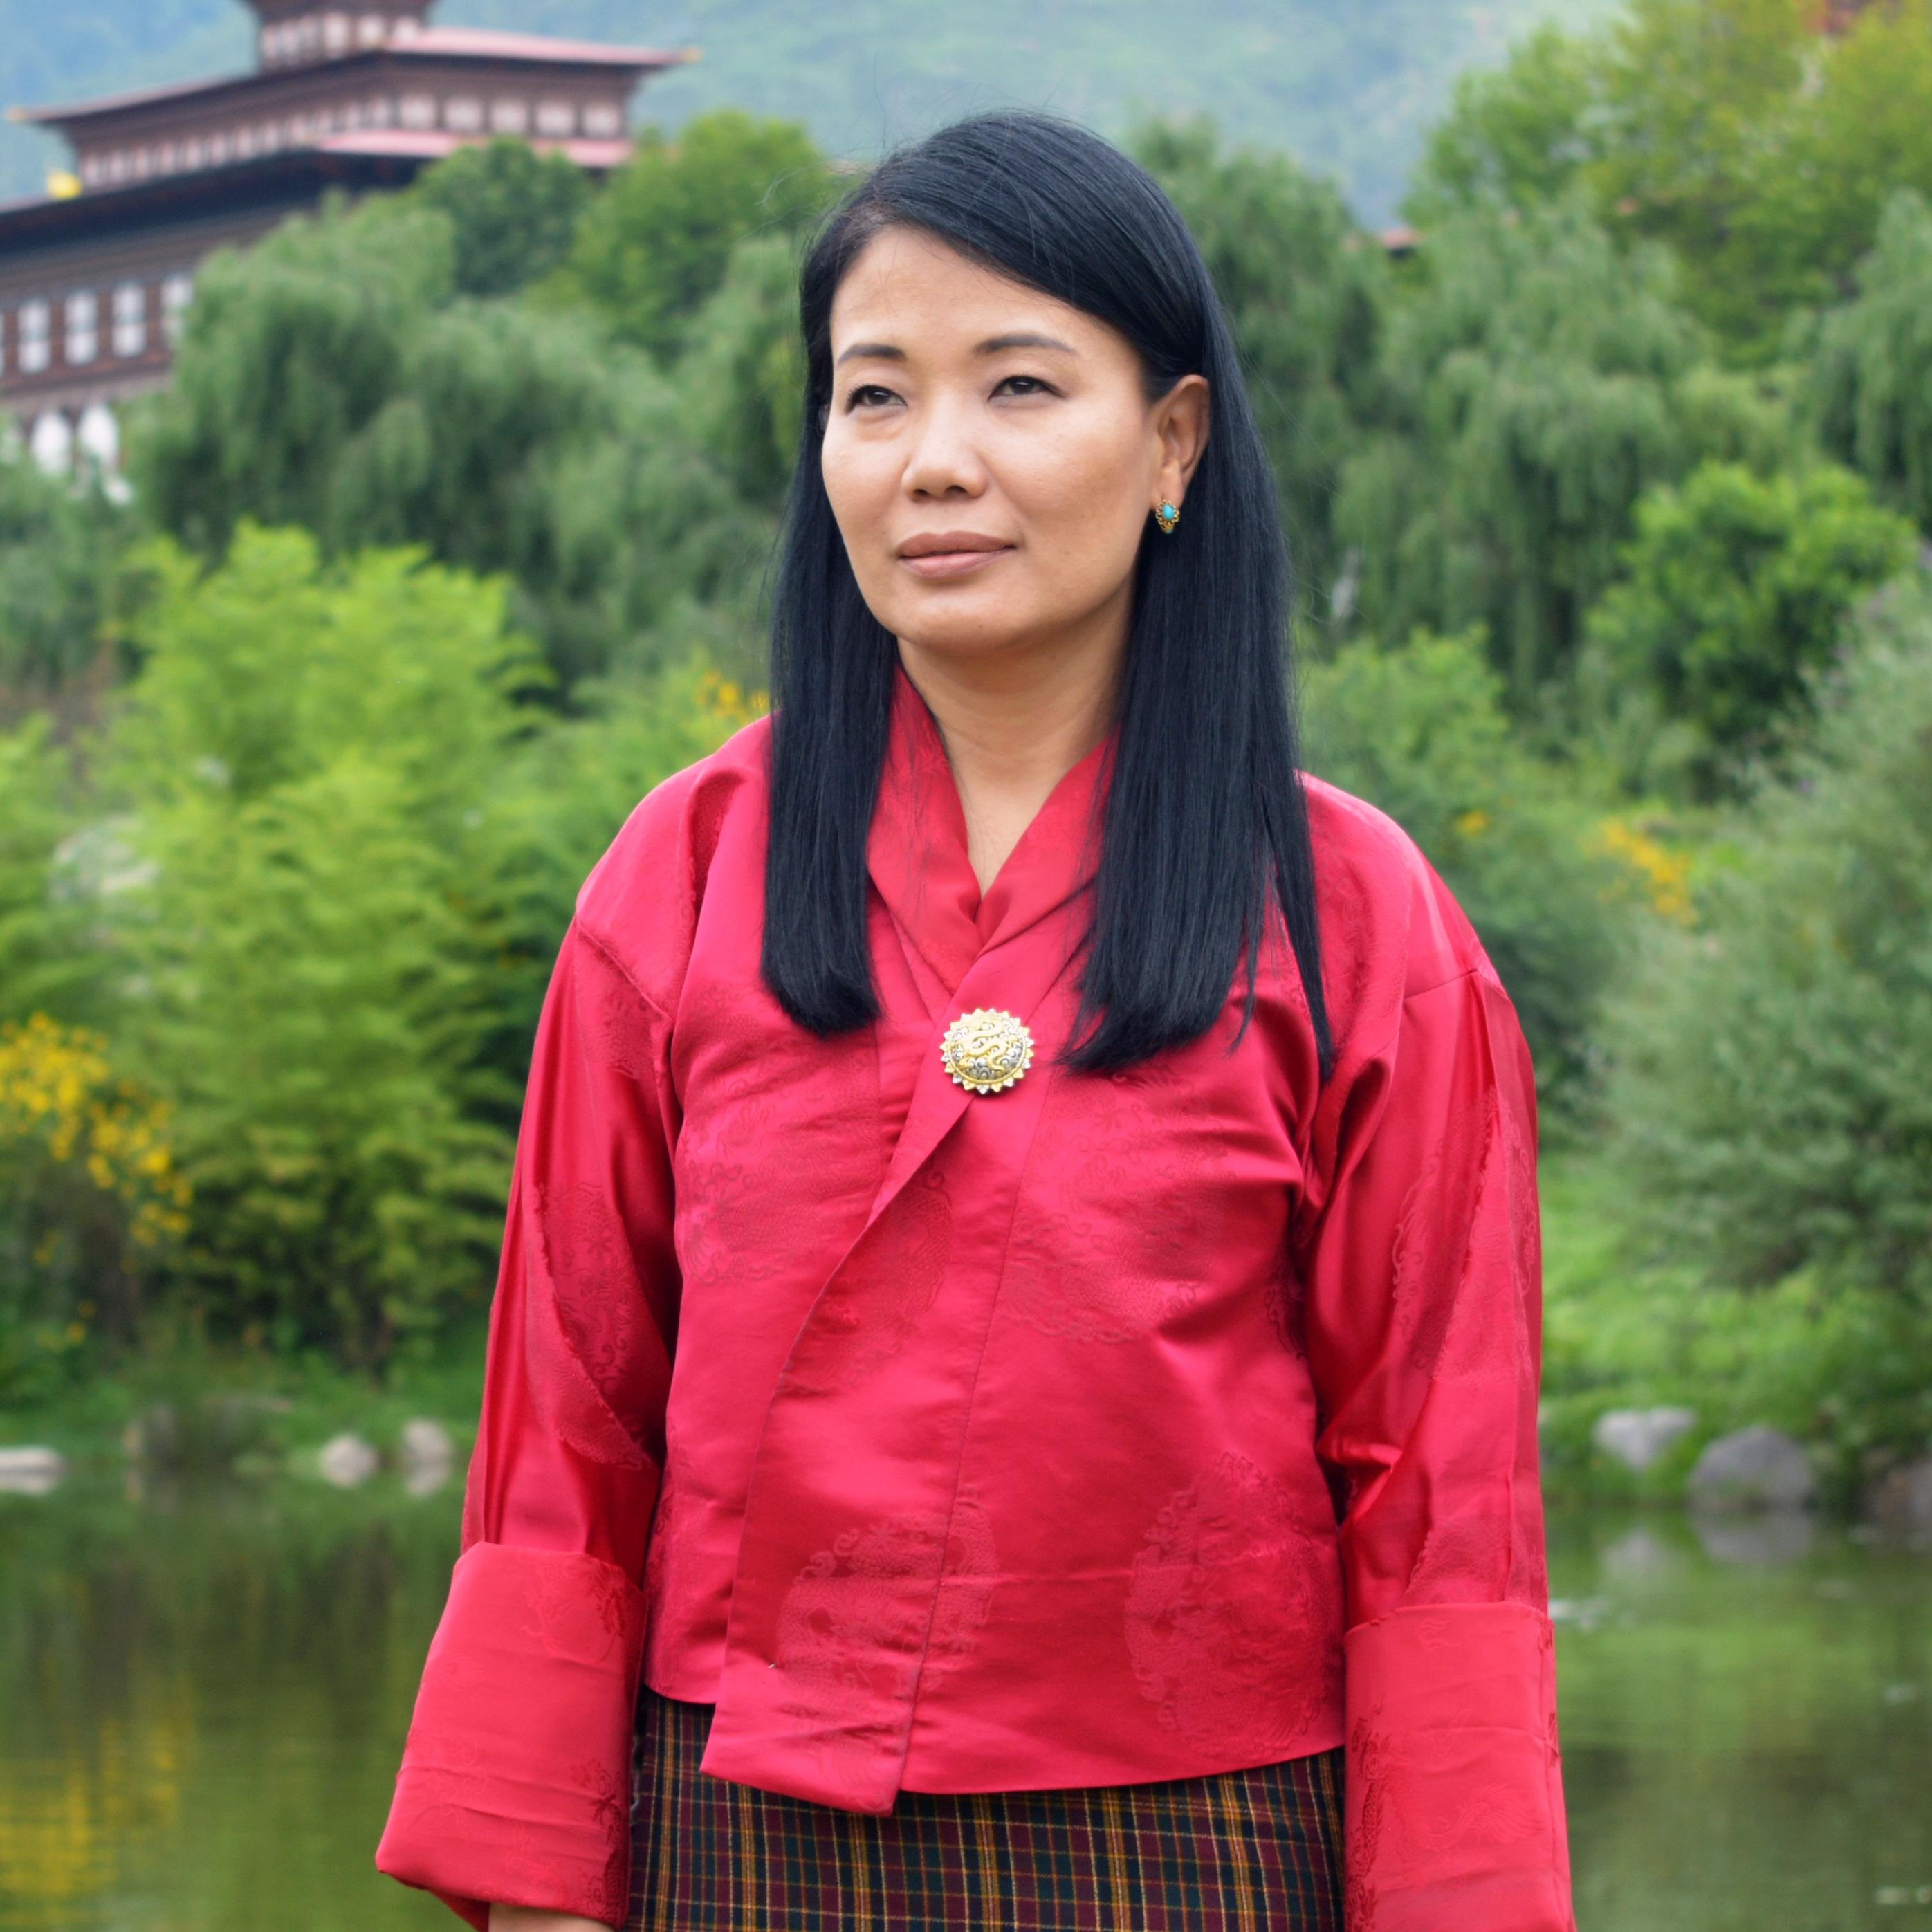 Tandin Wangmo is helping stop human trafficking in Bhutan